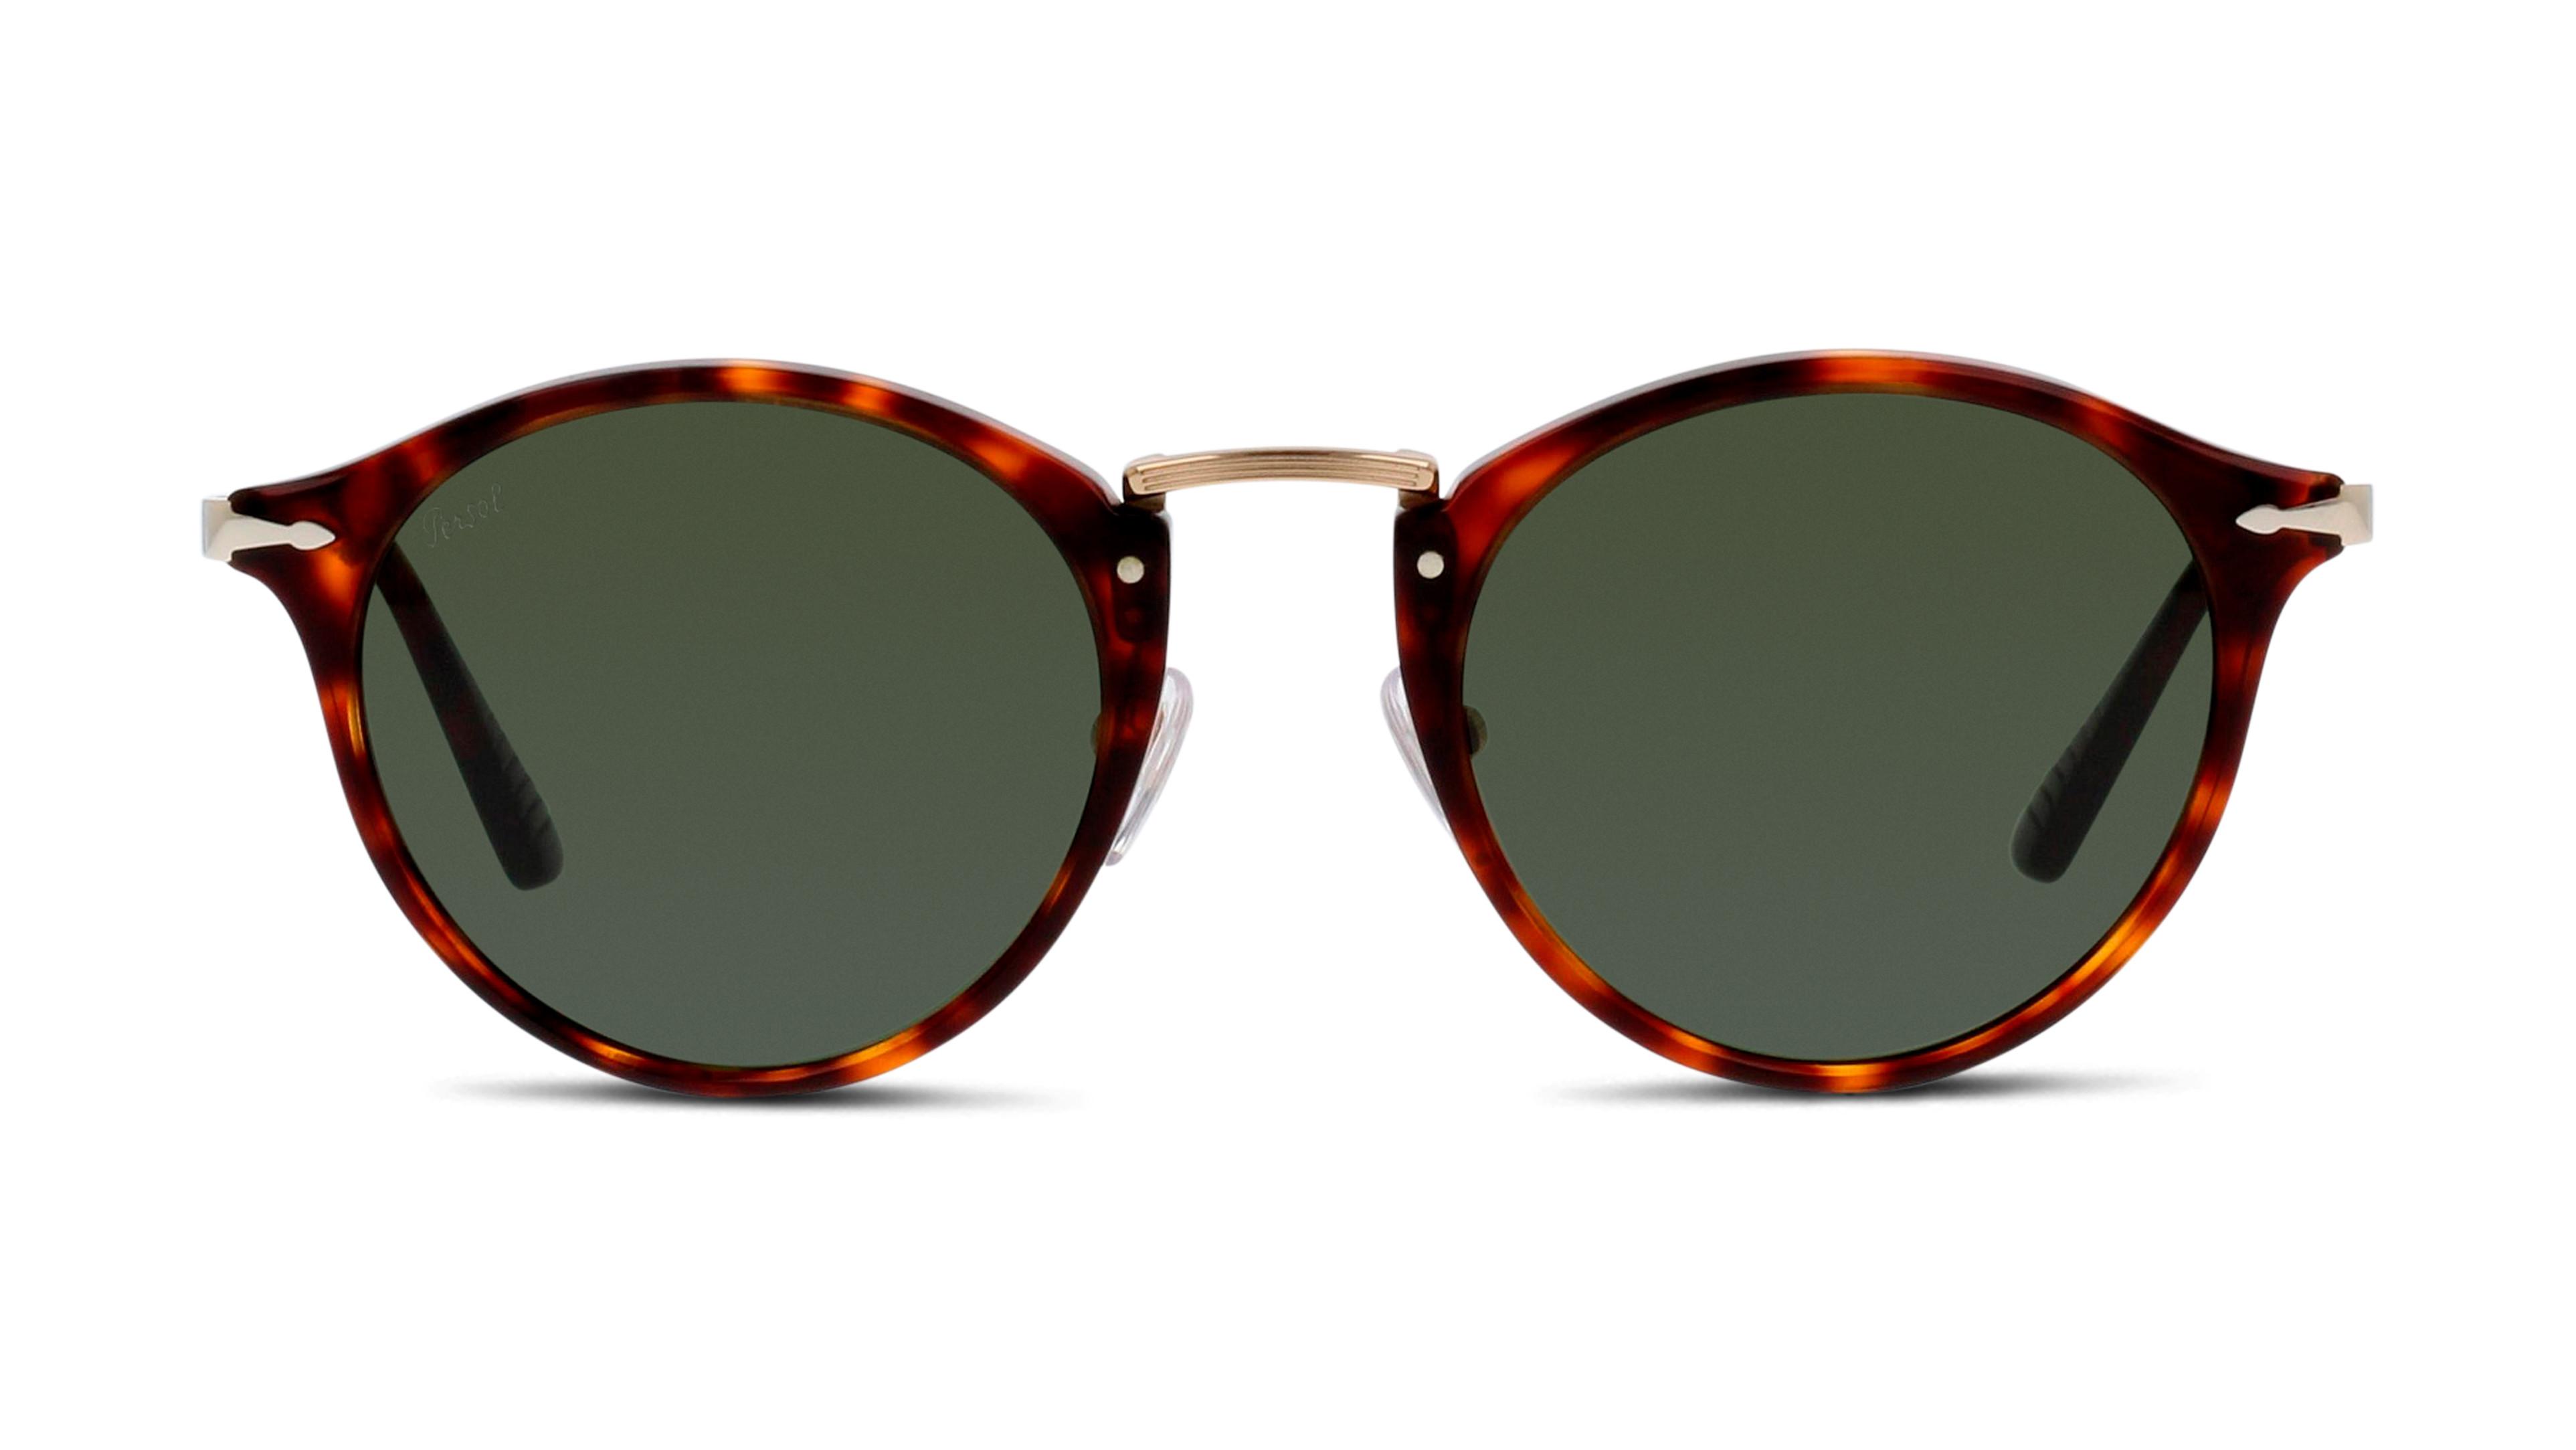 8053672666298-front-01-Persol-3166s-eyewear-havana